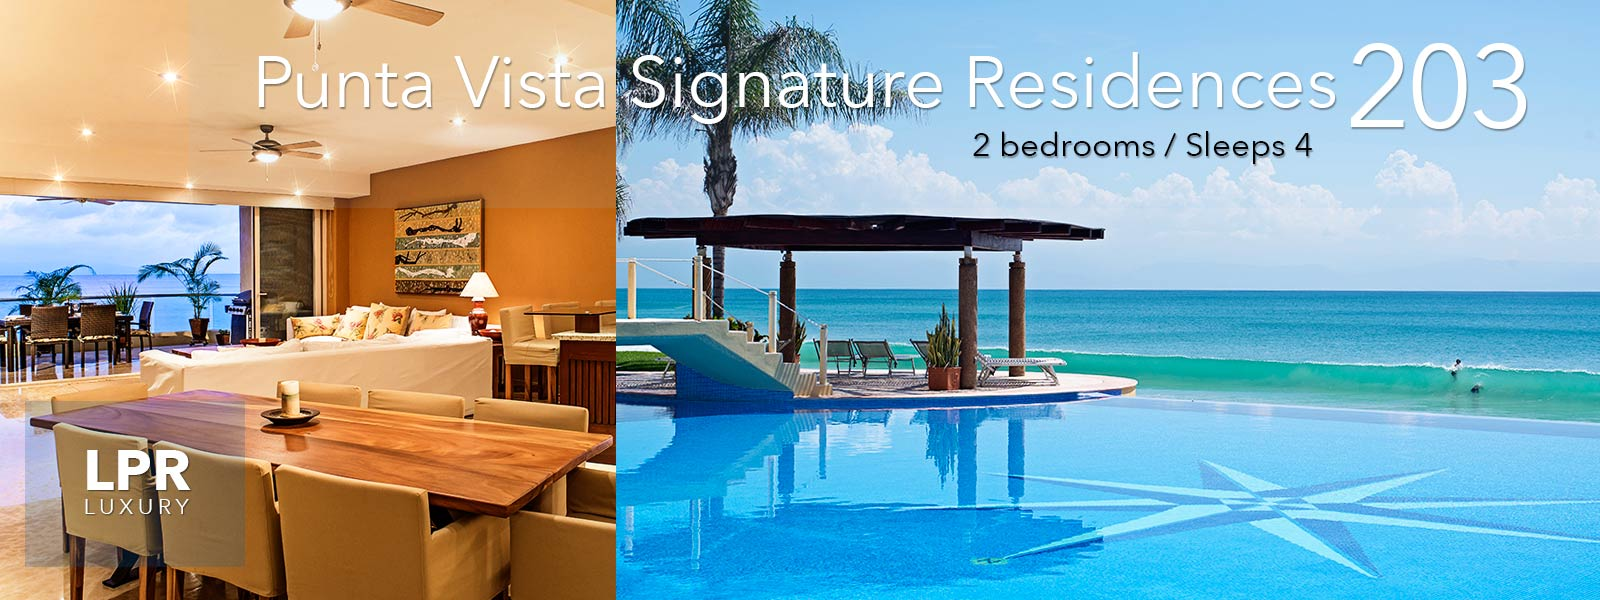 Punta Vista Signature Residences 203 - Playa Punta de Mita, Mexico